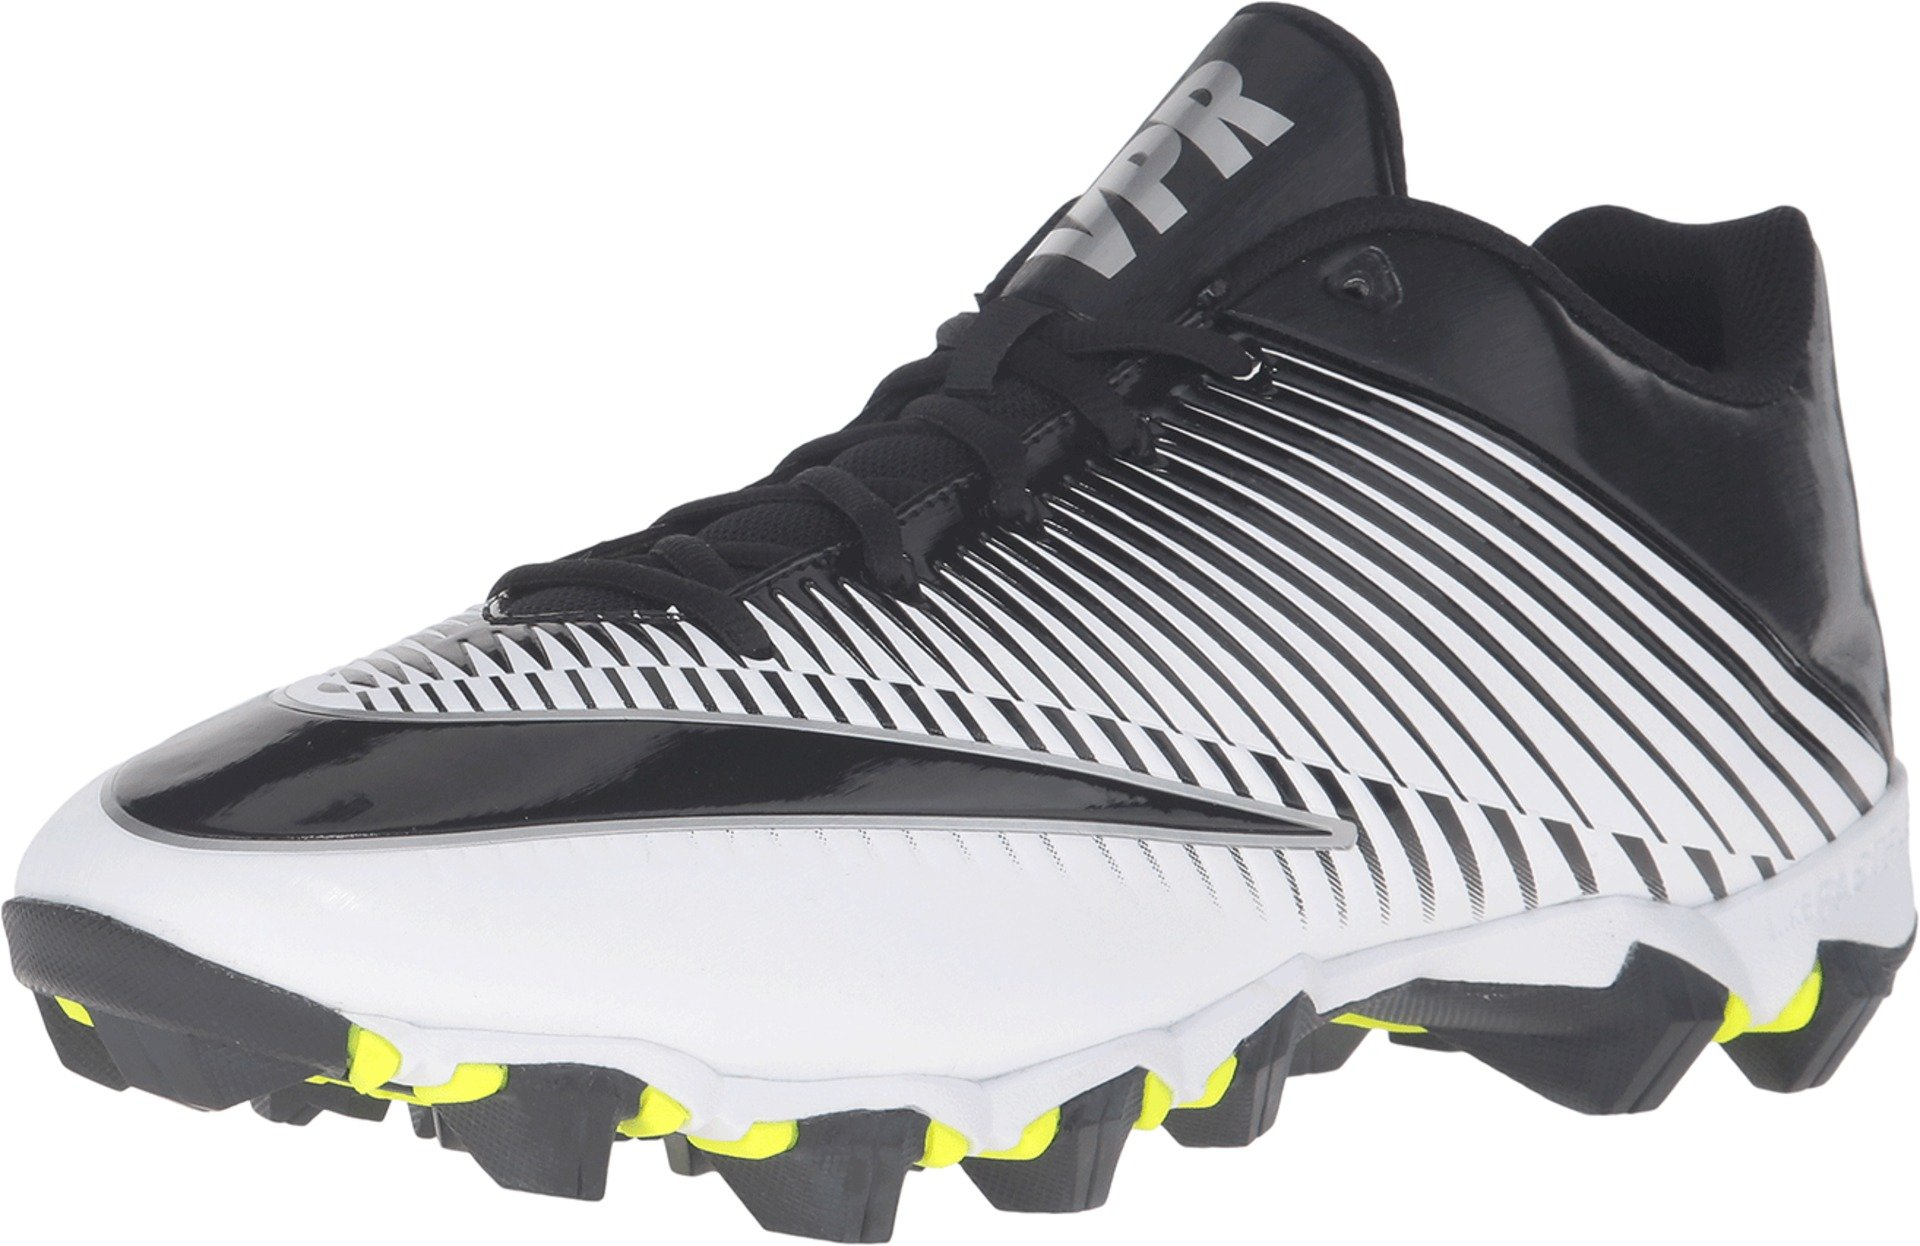 Nike Men's Vapor Shark 2 Football Cleat White/Metallic Silver/Black Size 8.5 M US